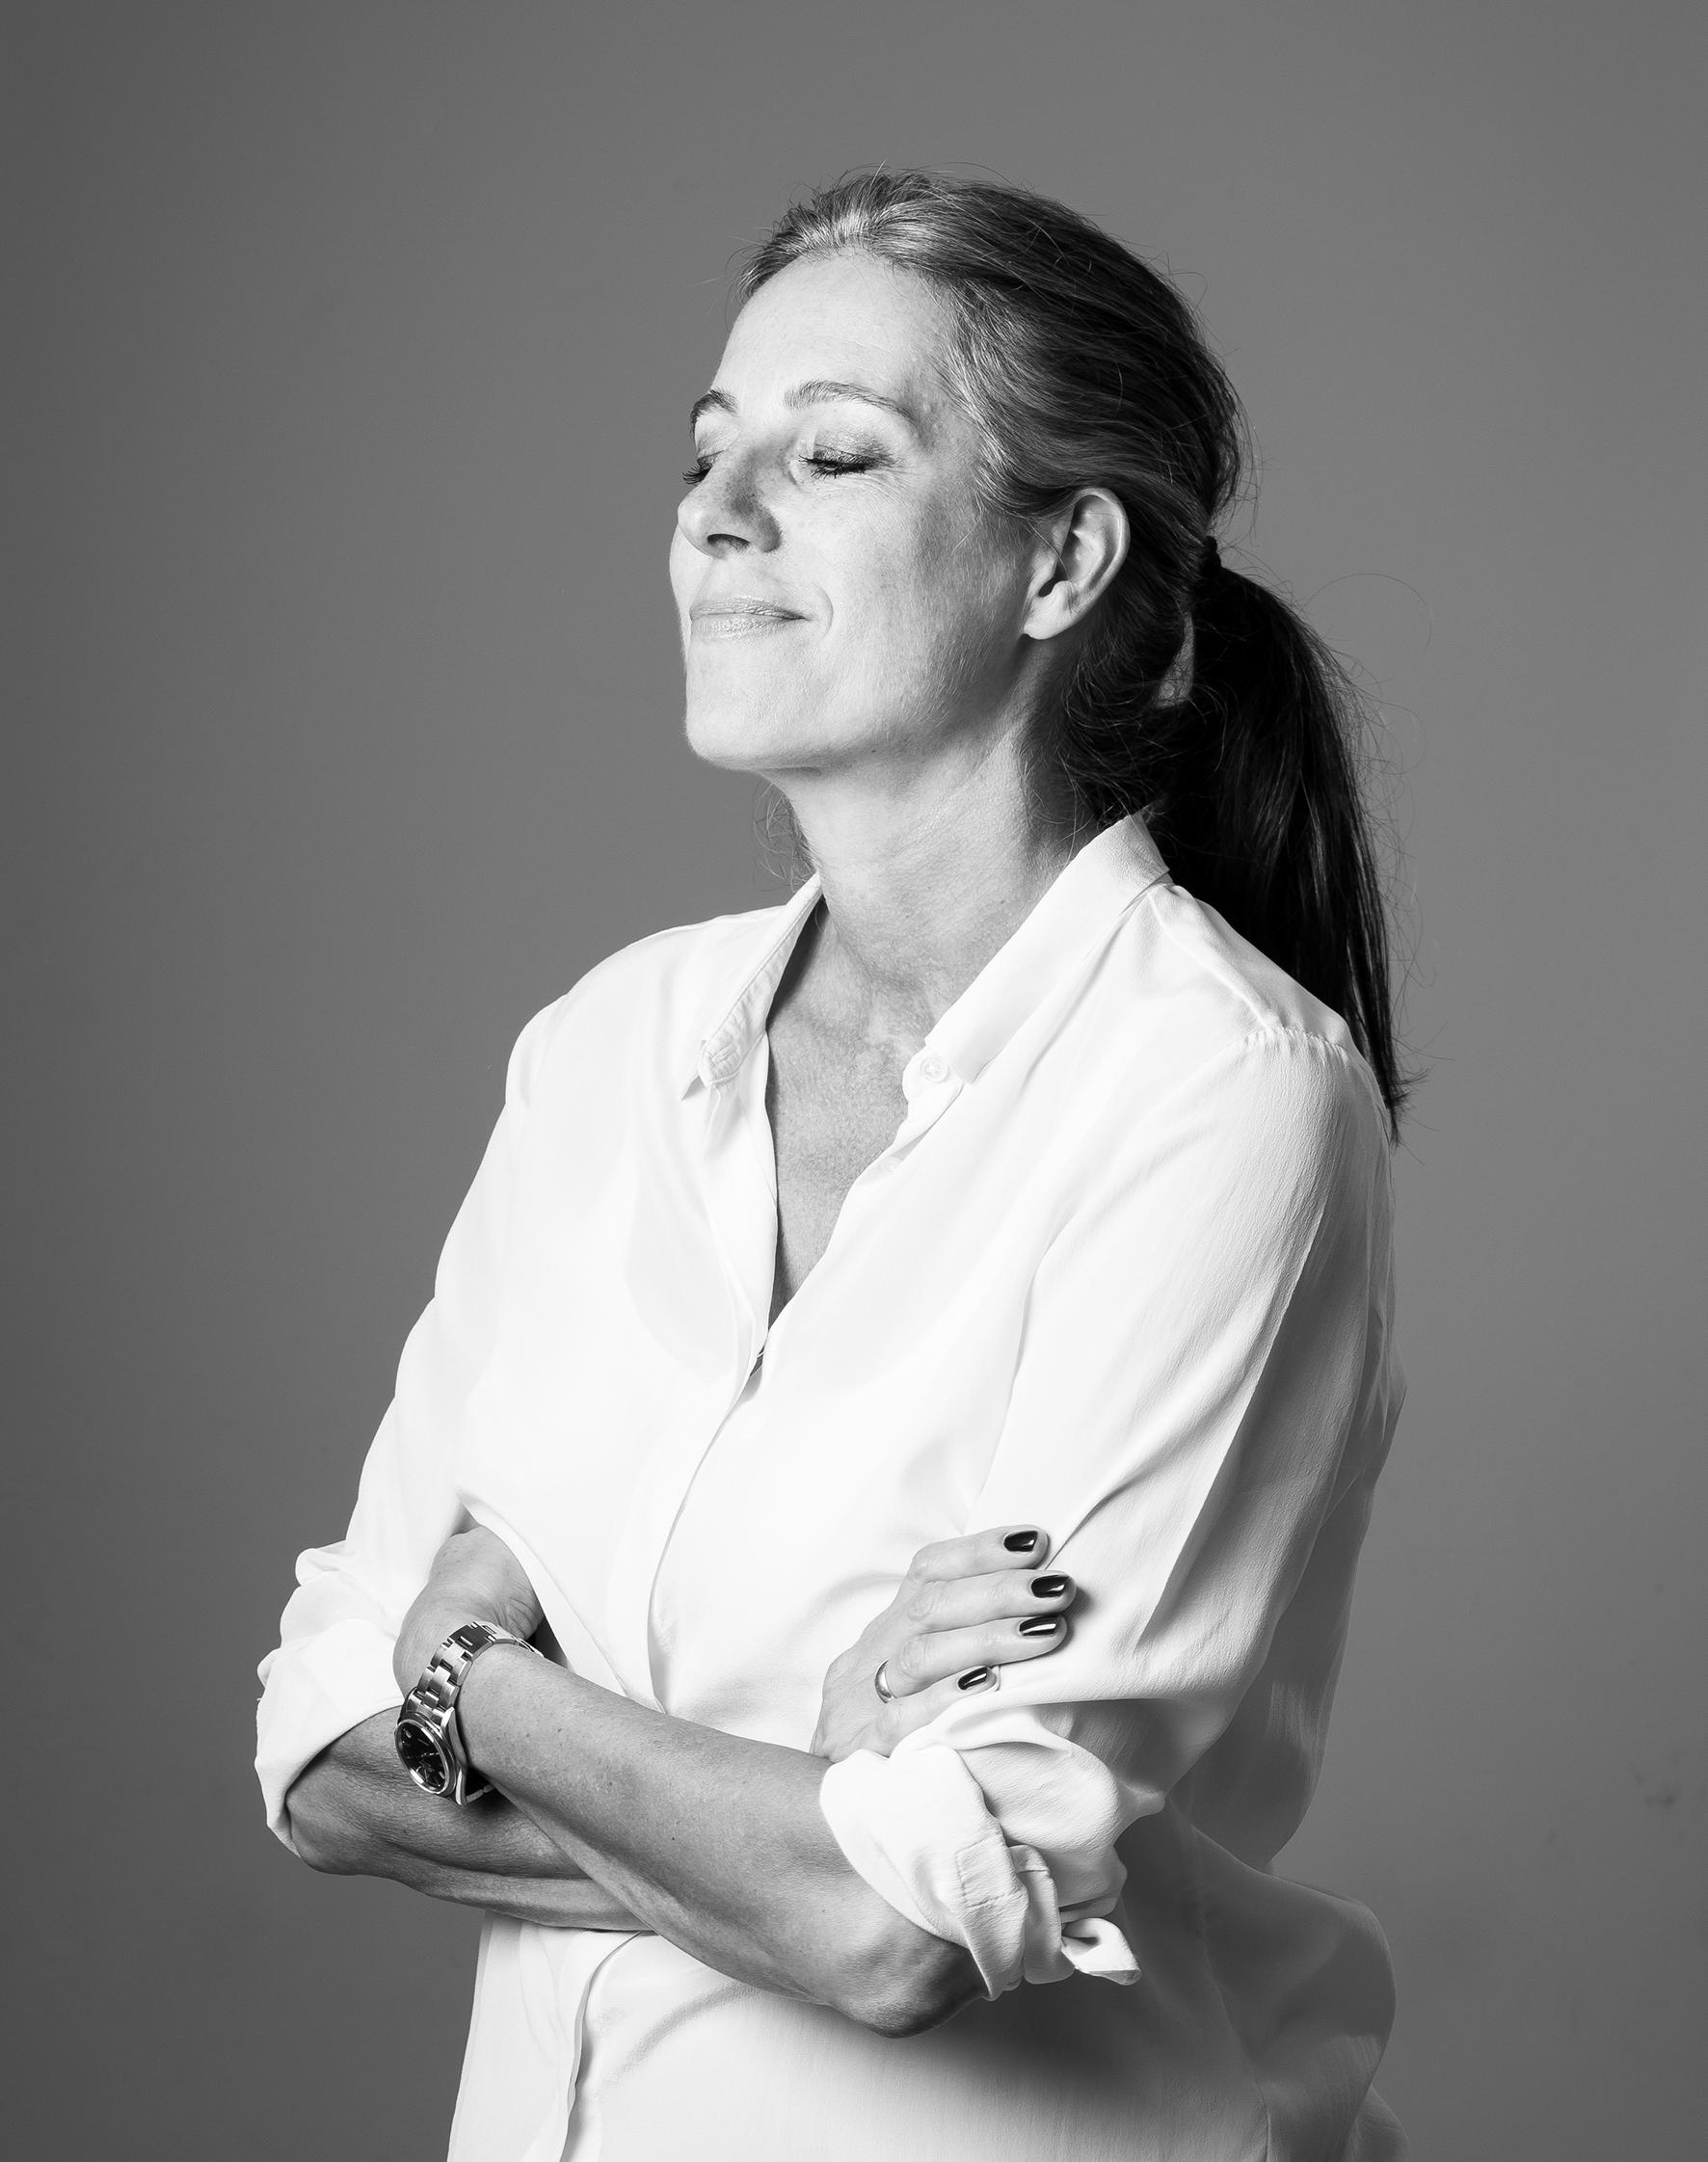 Silke-Gueldner-Portrait-Beratung-fuer-Fotografen